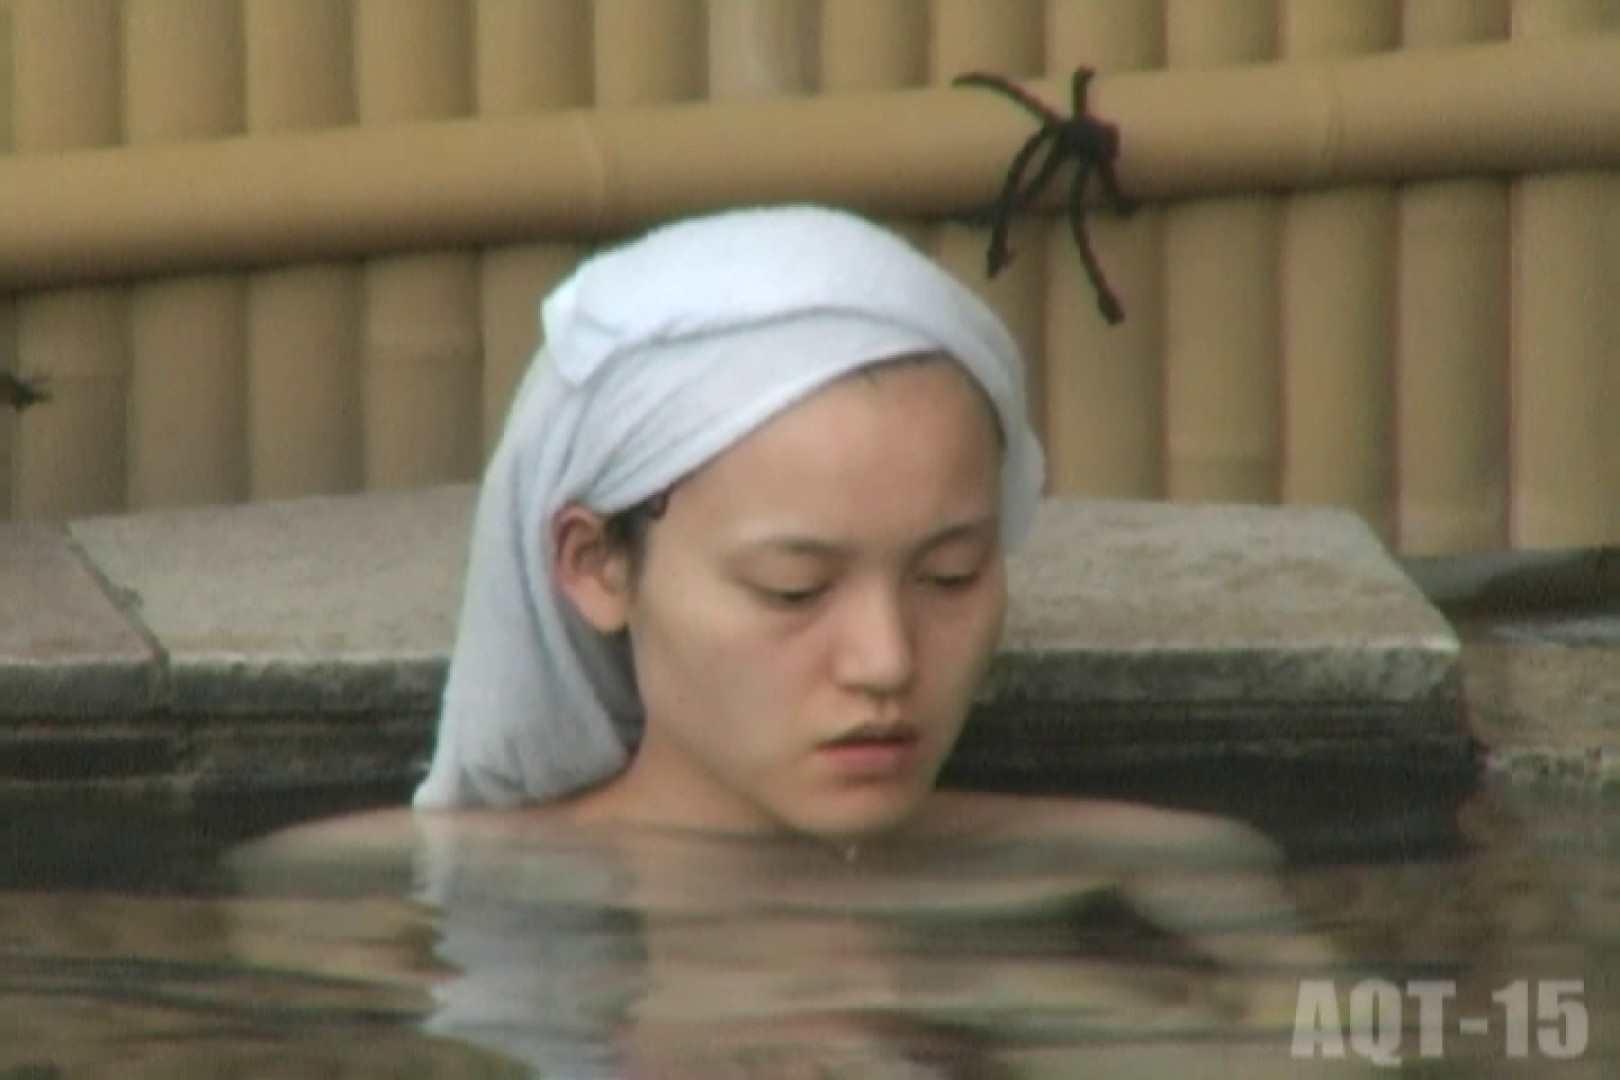 Aquaな露天風呂Vol.836 女体盗撮 盗撮アダルト動画キャプチャ 98連発 80